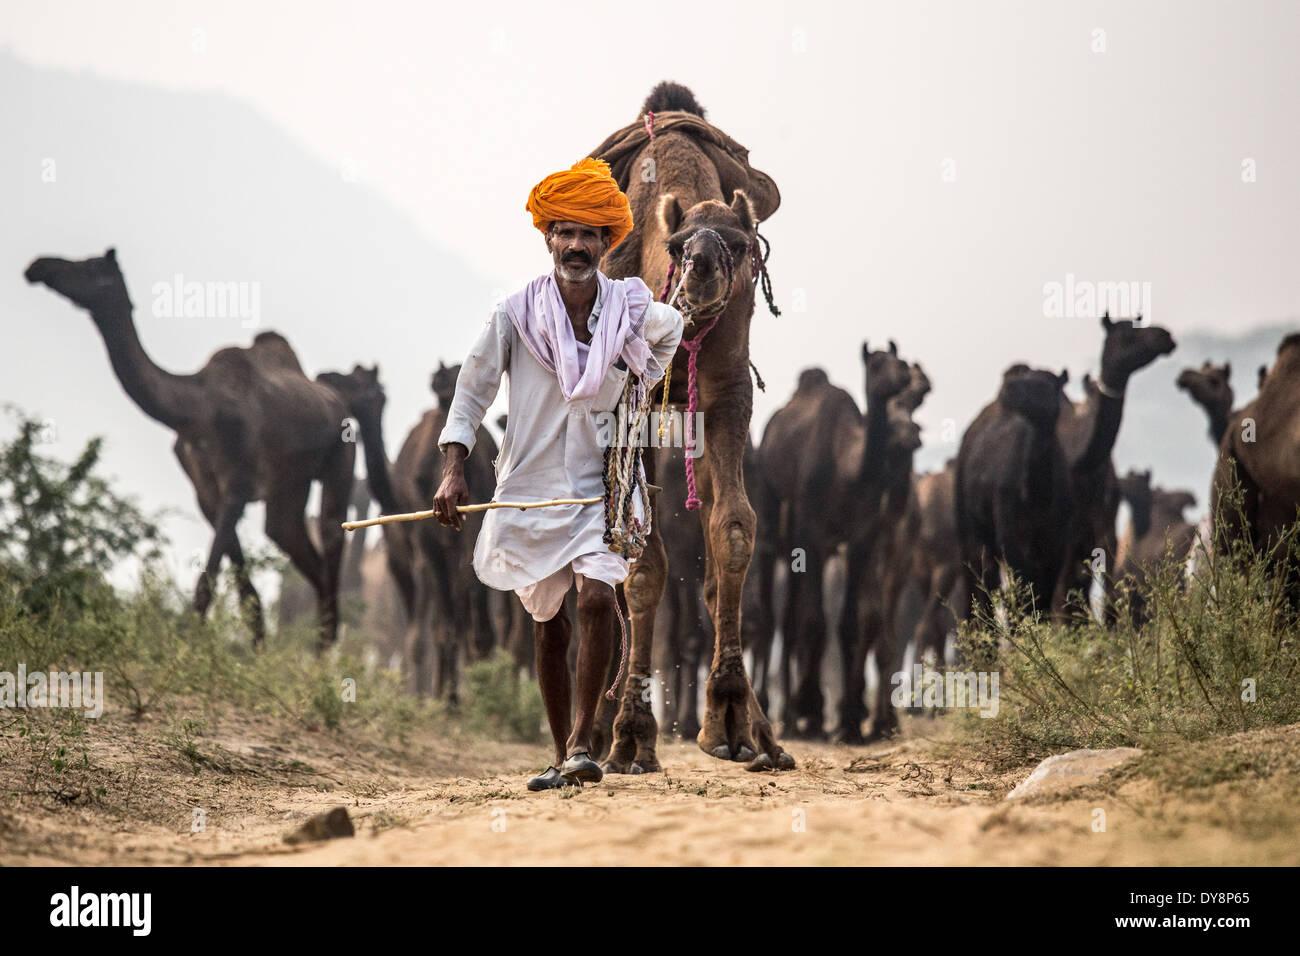 Pushkar Camel Mela, Pushkar, Rajasthan, India - Stock Image